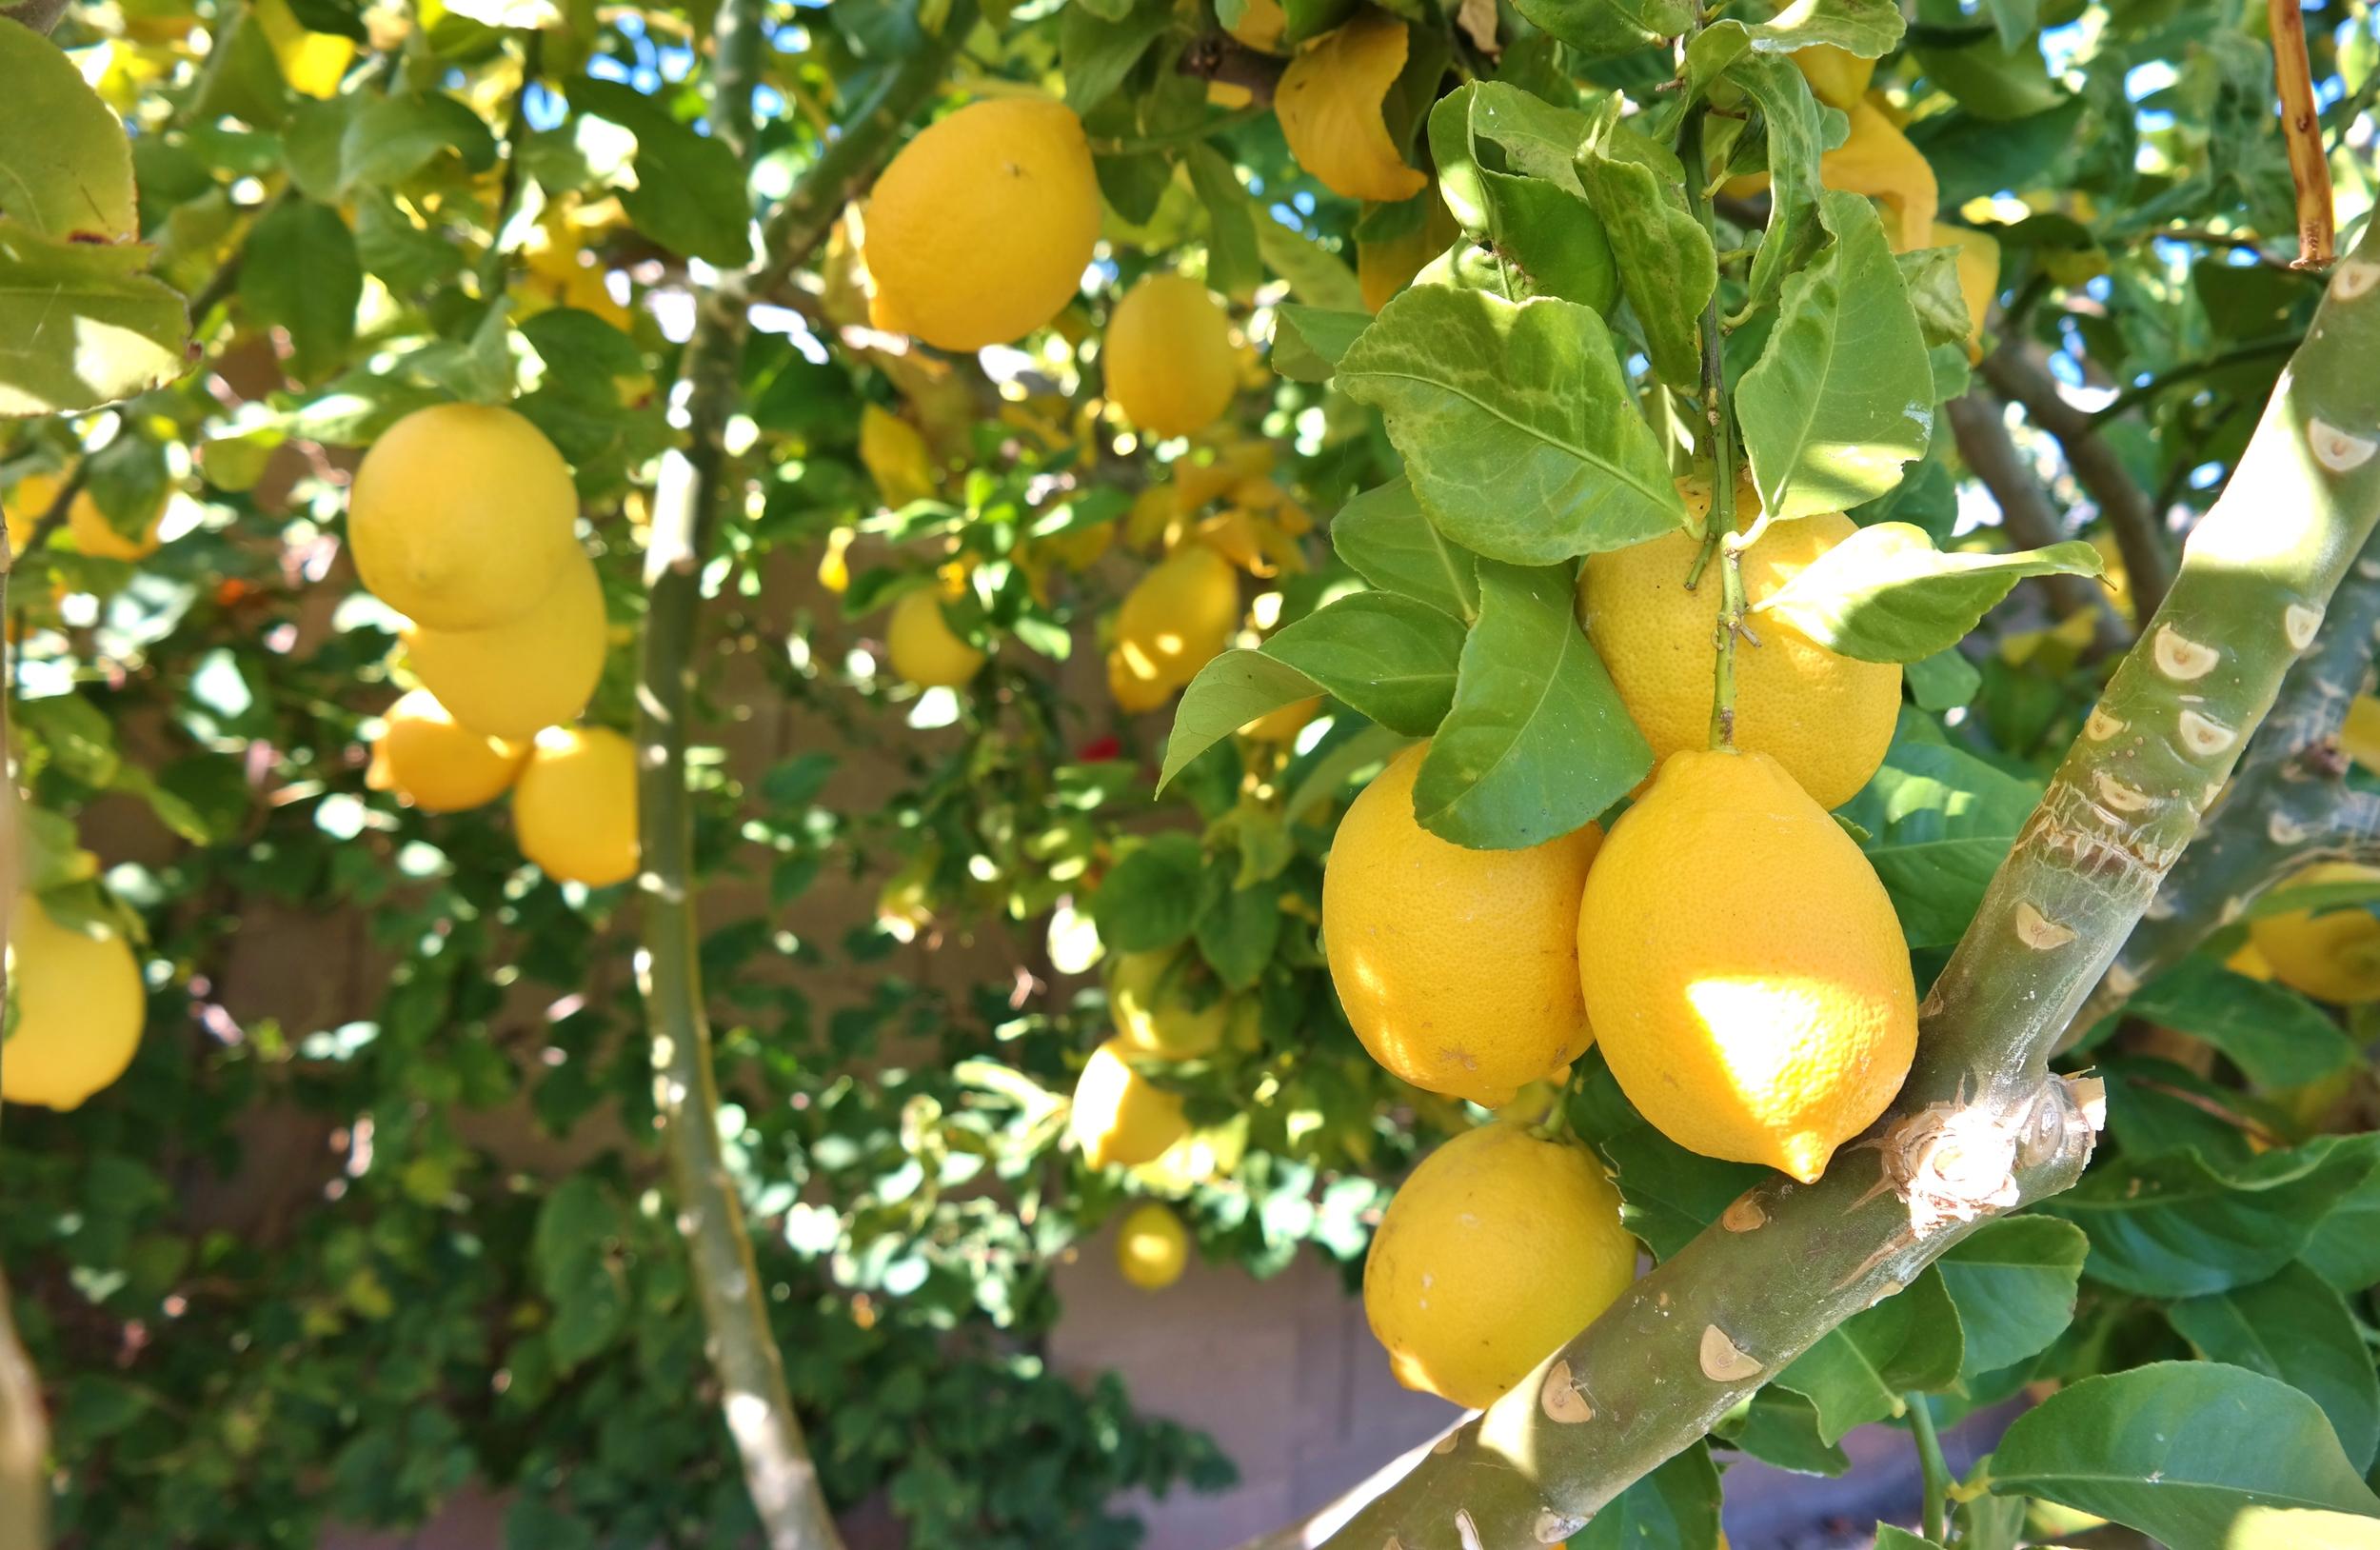 Lisbon lemons